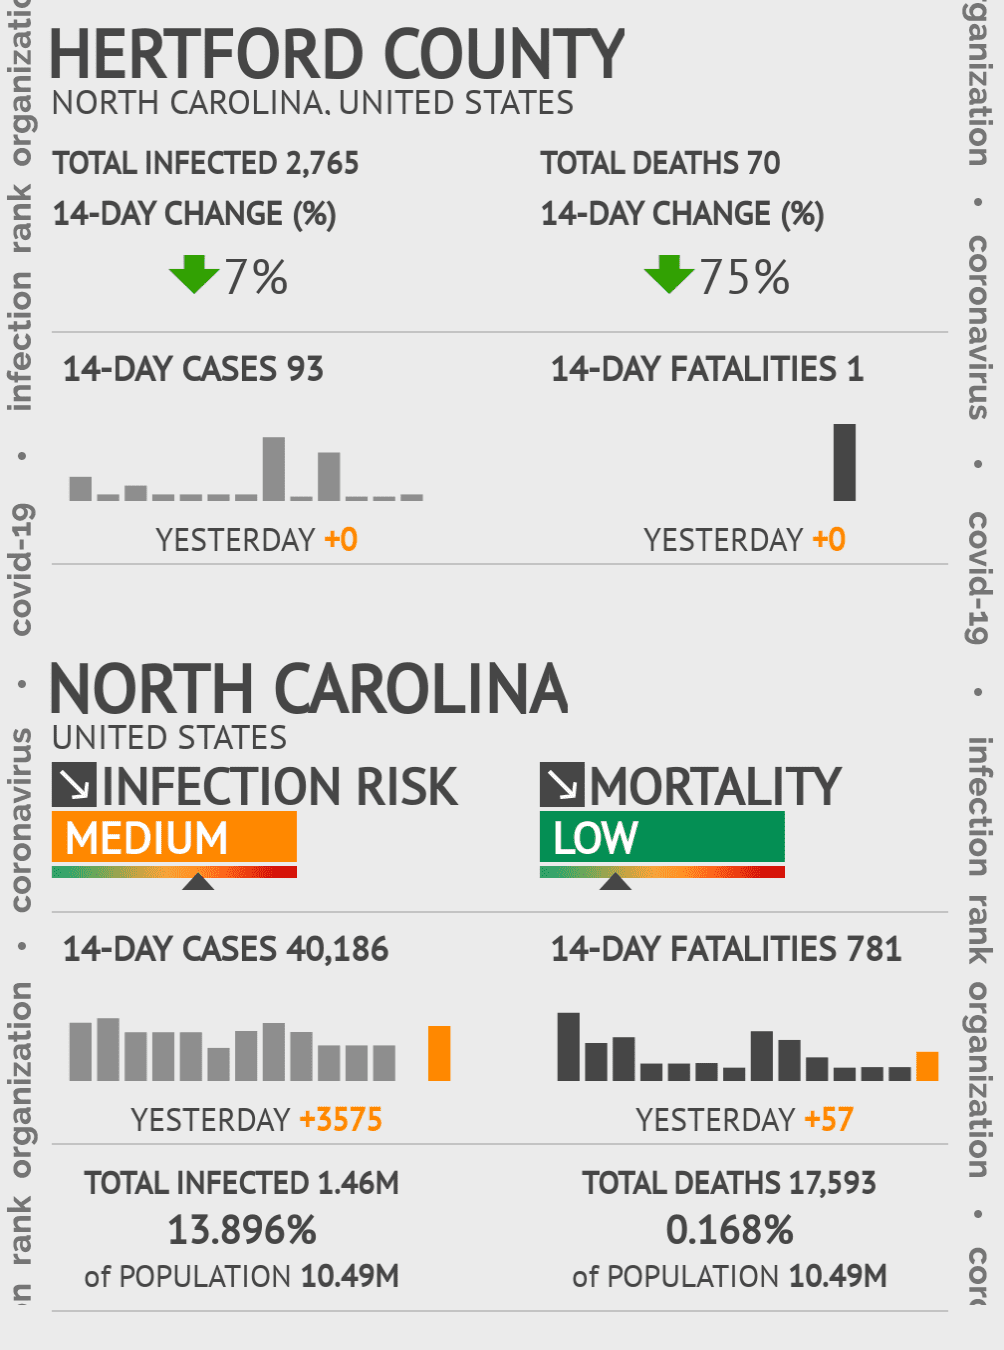 Hertford County Coronavirus Covid-19 Risk of Infection on November 23, 2020